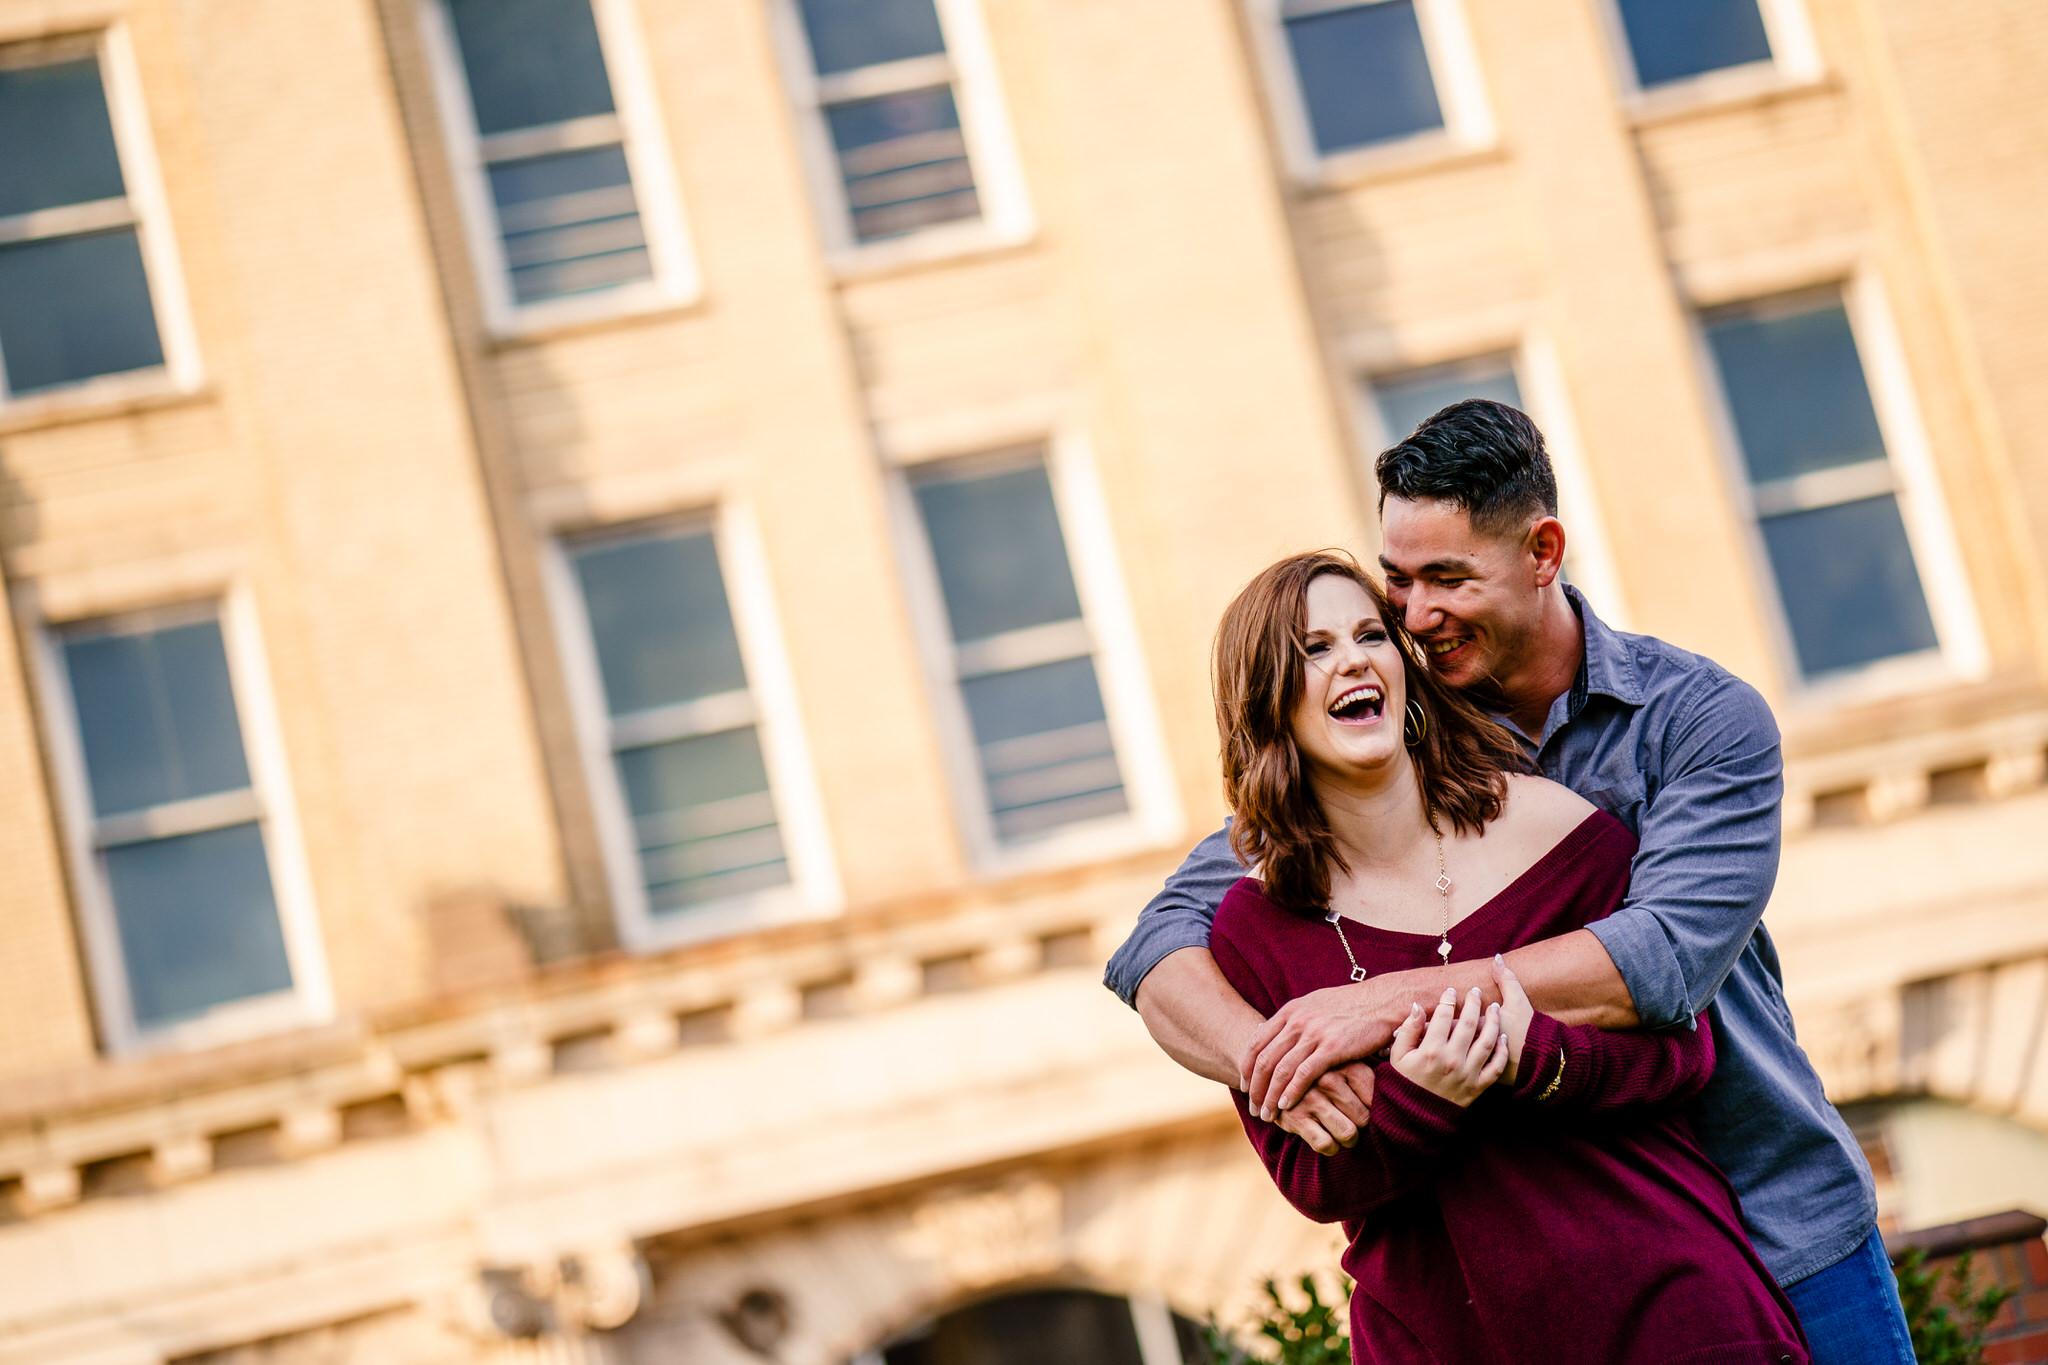 Shelby&Ye-New-Bern-Engagement-Photography-Chad-Winstead-004-1.jpg